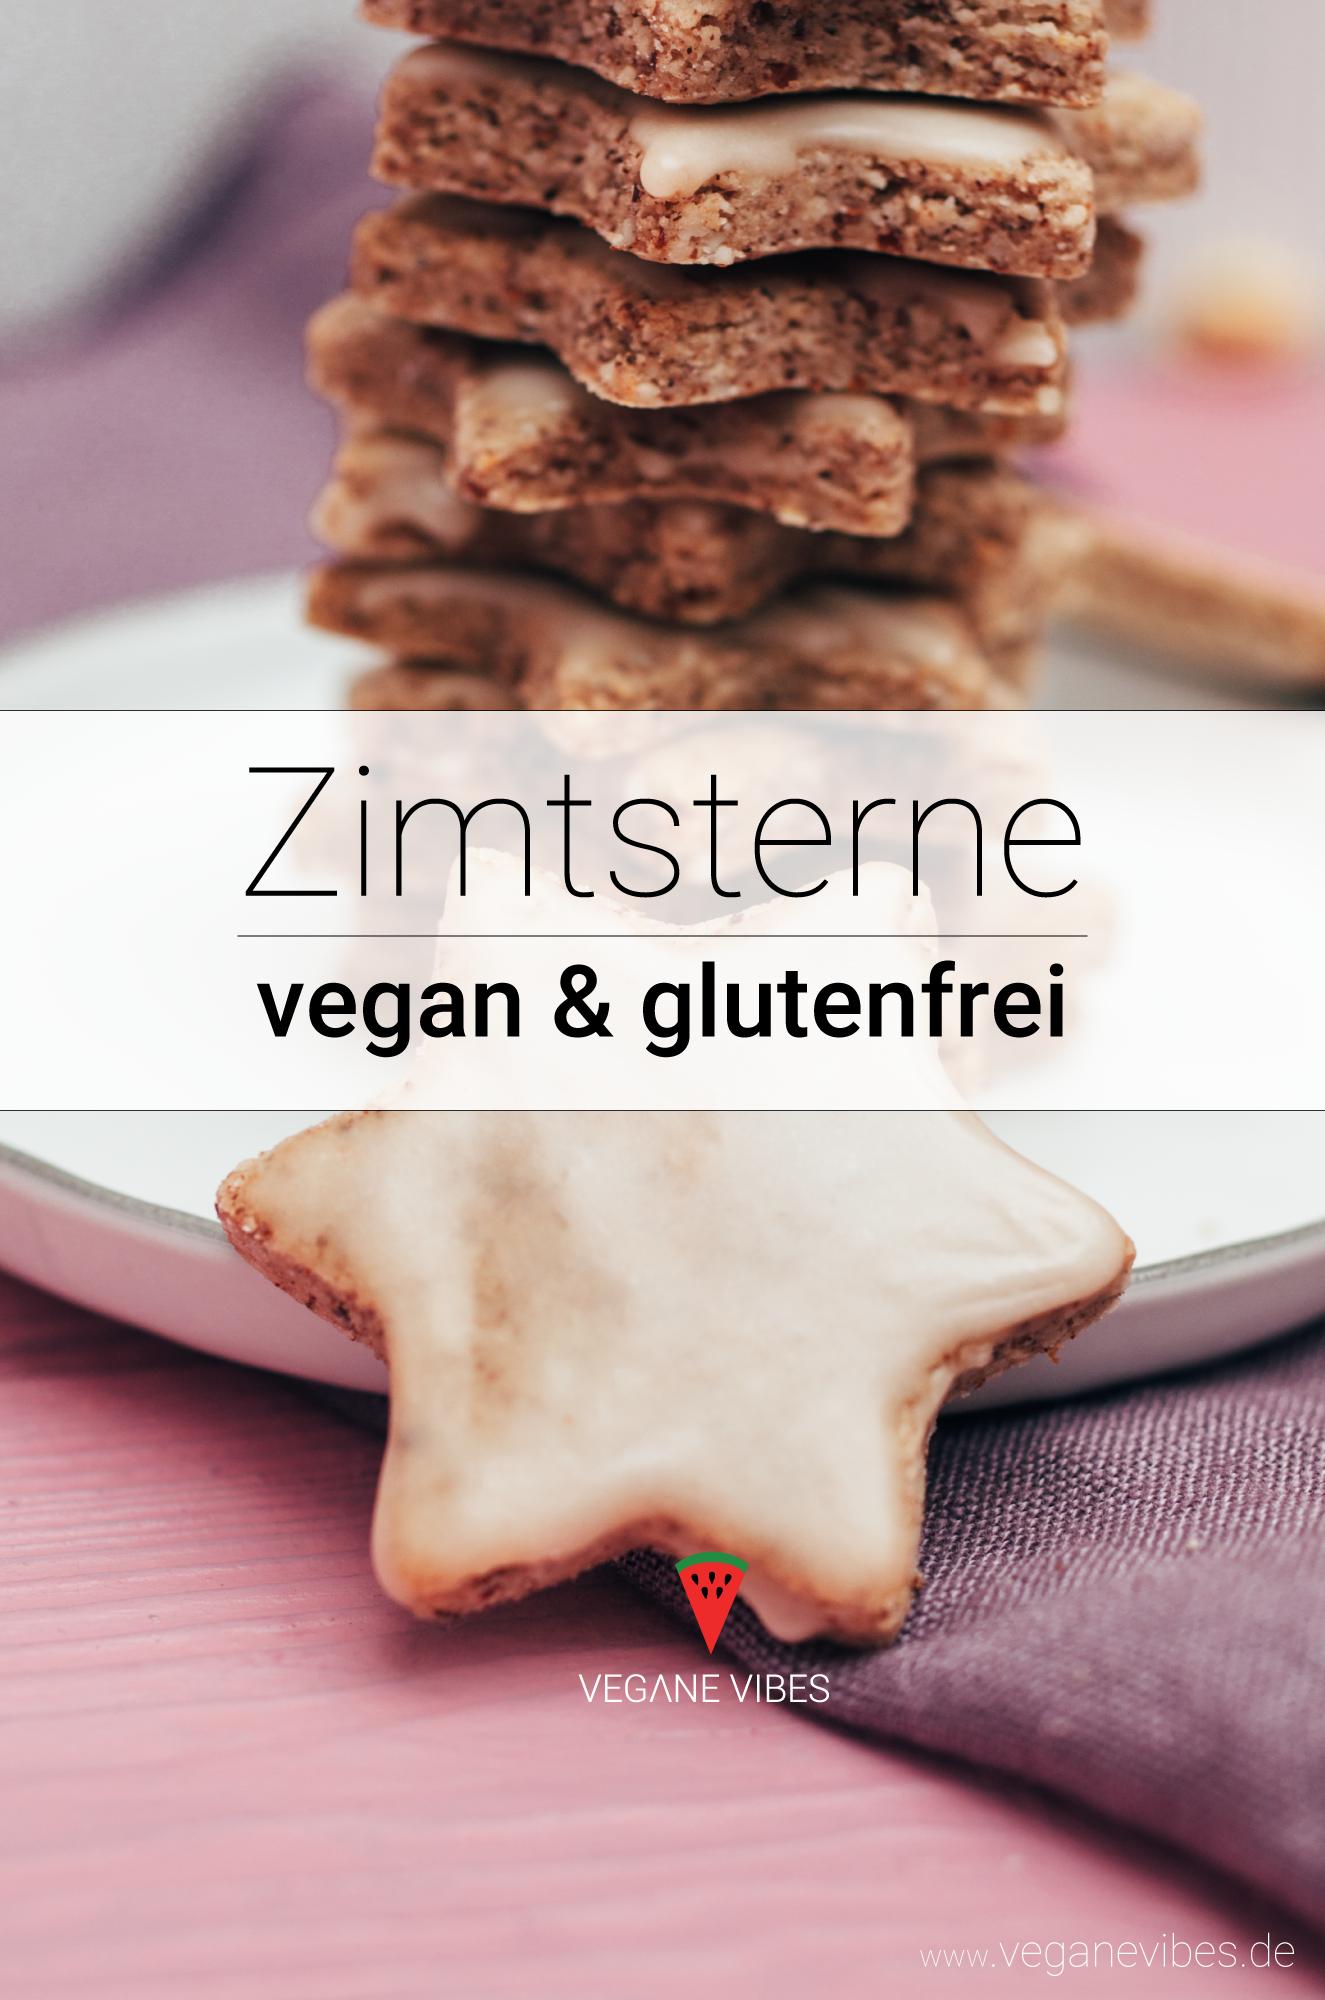 Ricetta con stelle di cannella a 6 ingredienti (vegana, senza glutine)